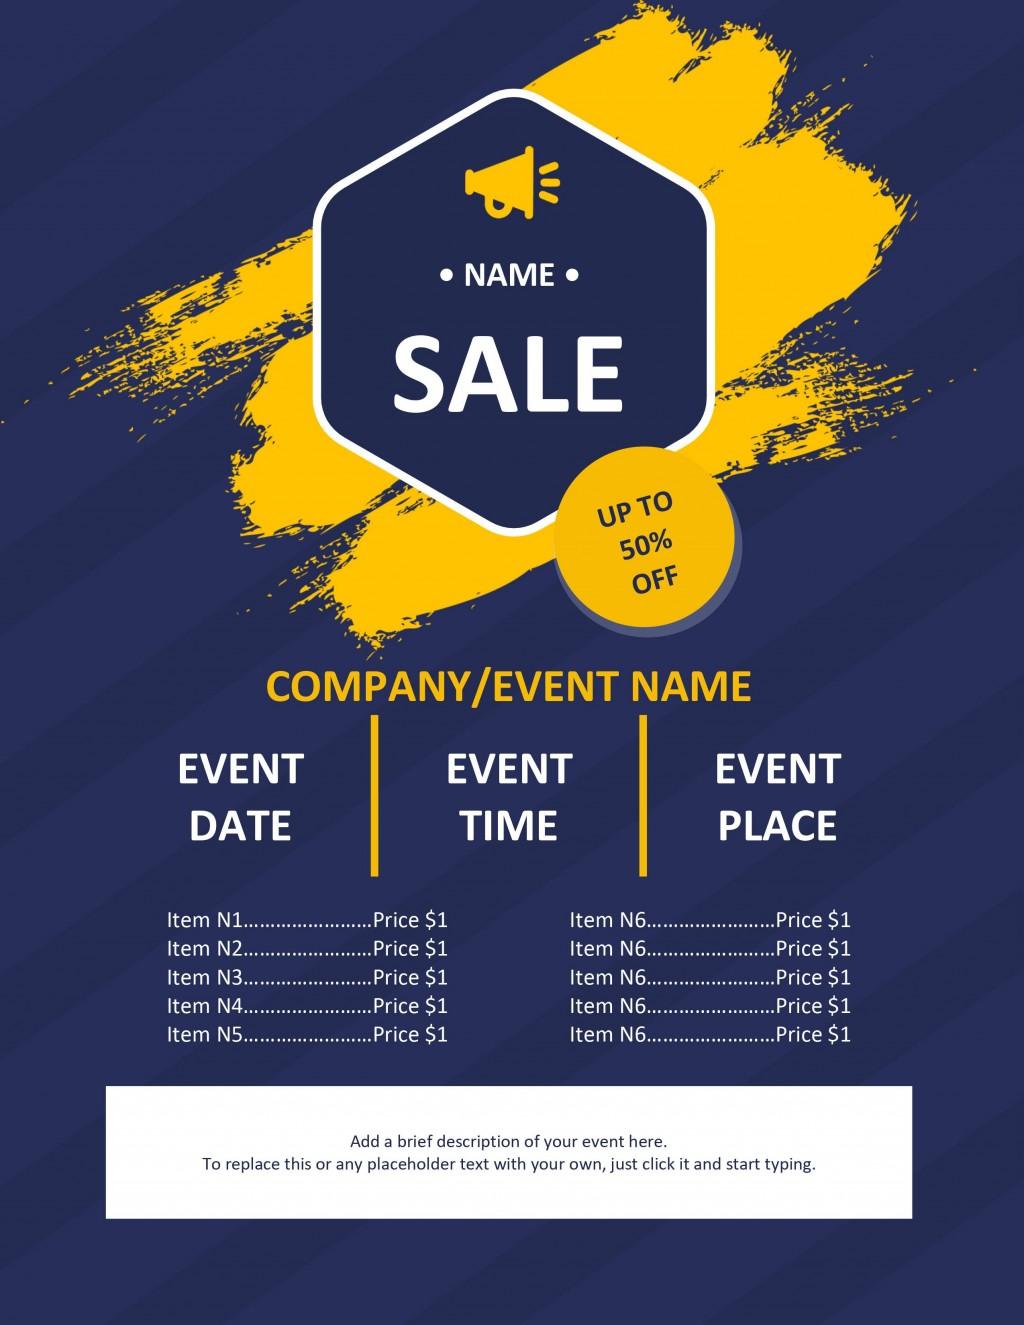 006 Impressive Event Flyer Template Free Word Sample Large